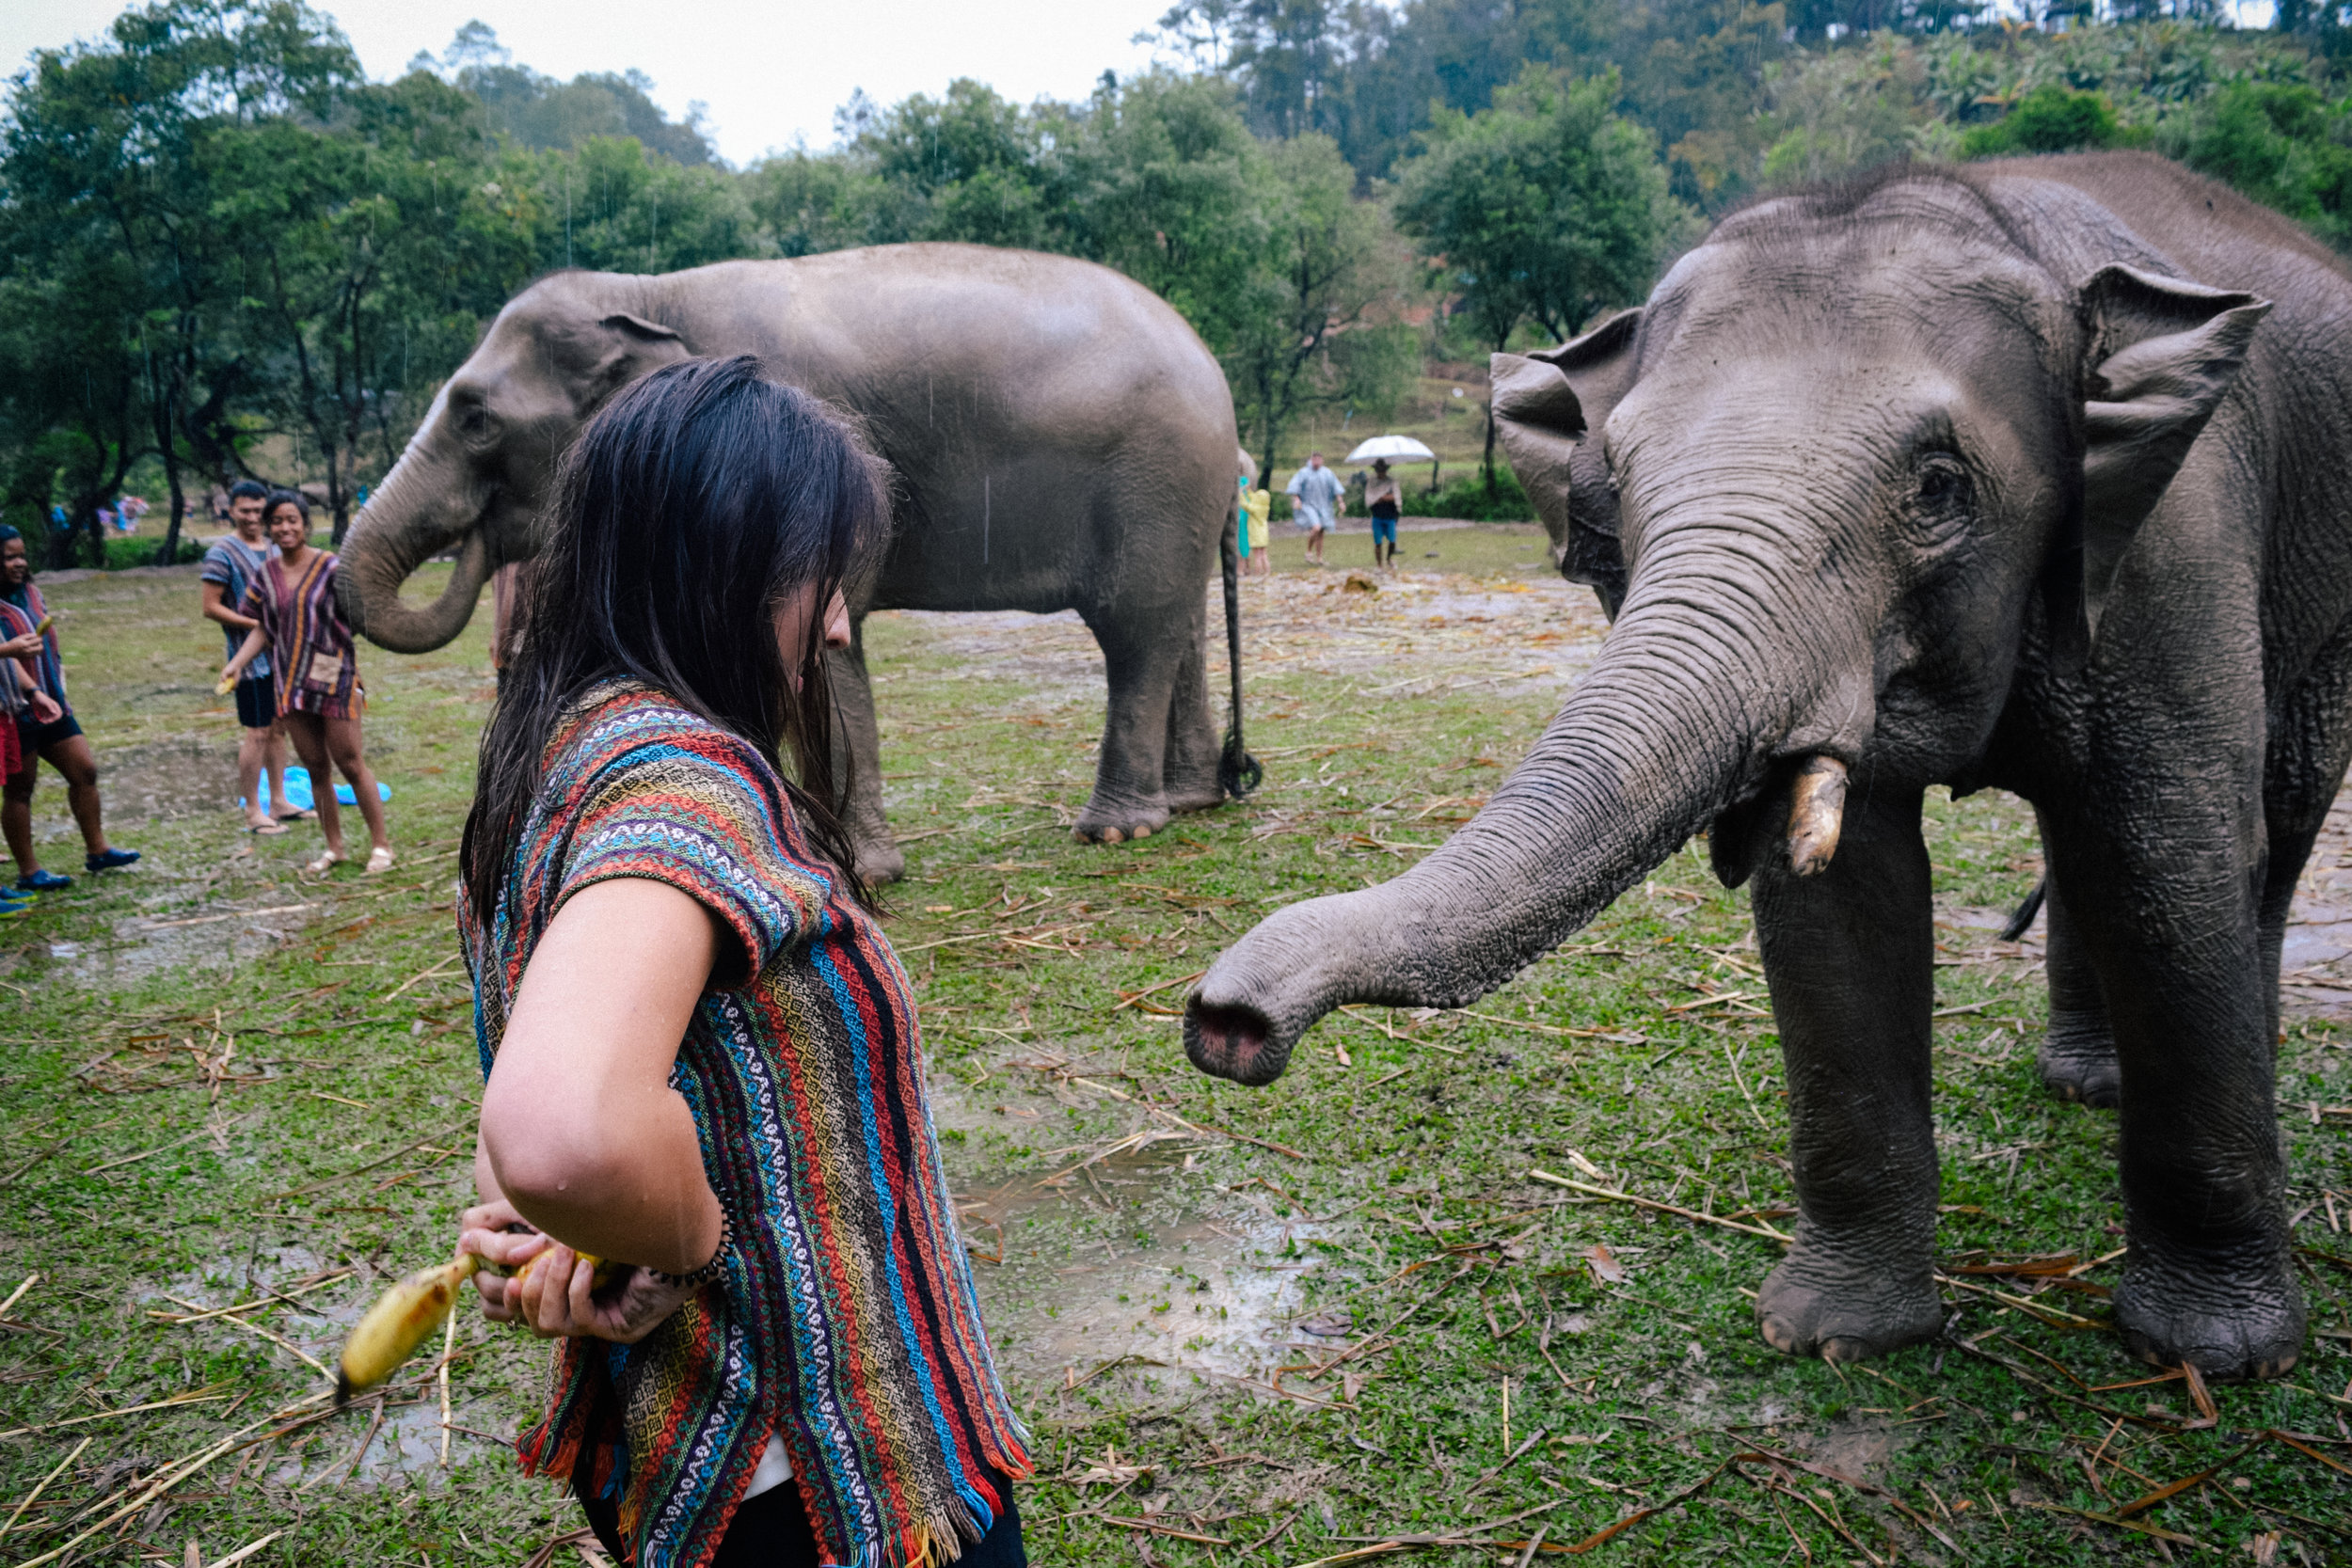 bananas reaching for the elephant